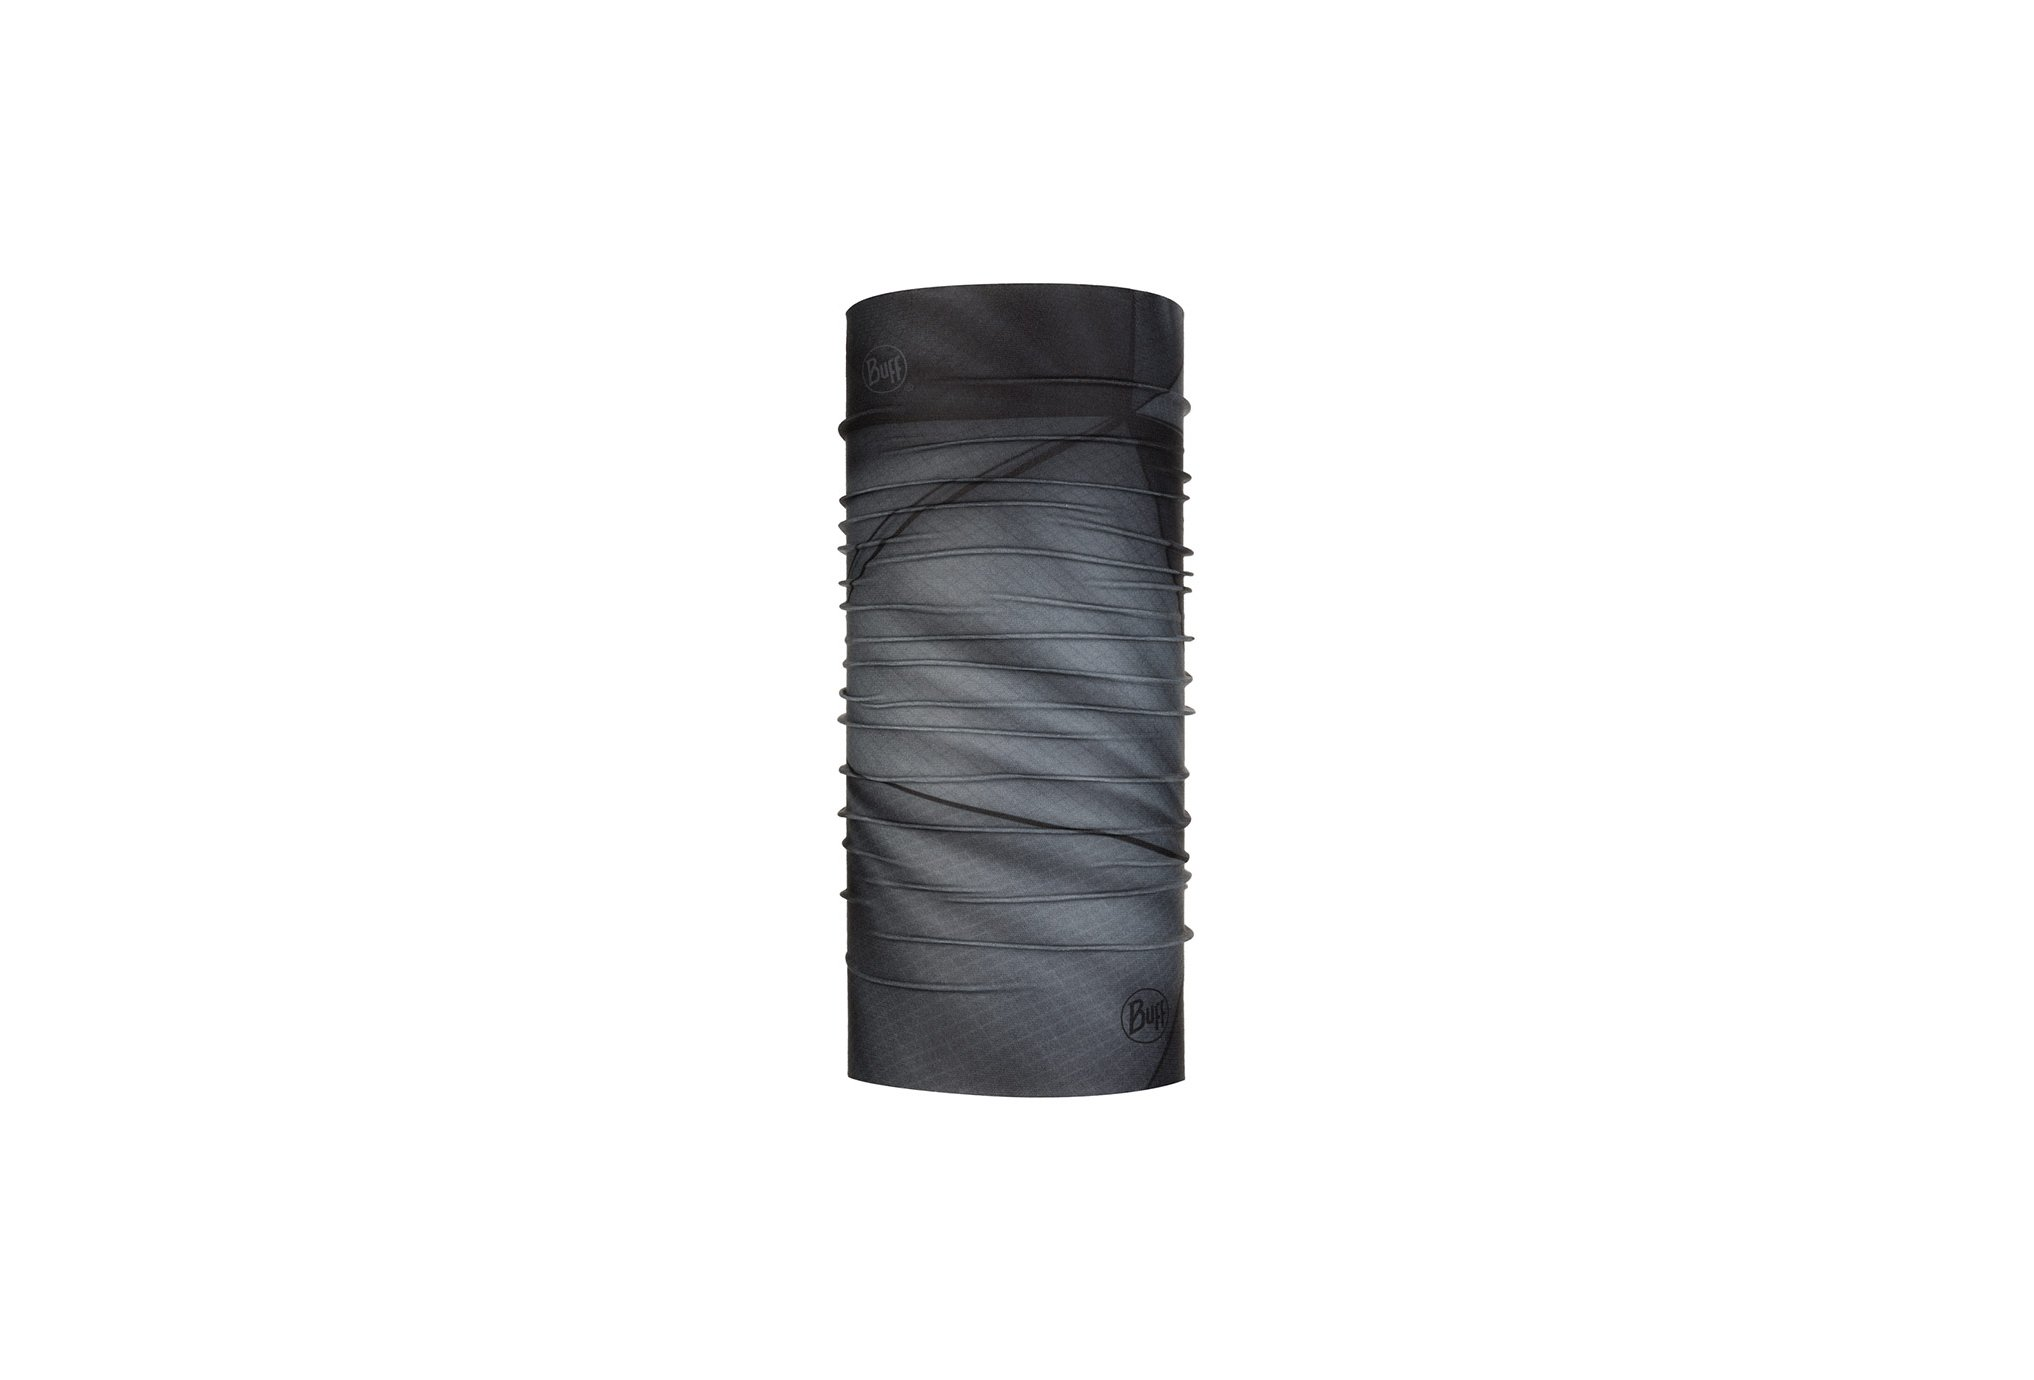 Buff Coolnet UV+ Vivid Grey Tours de cou